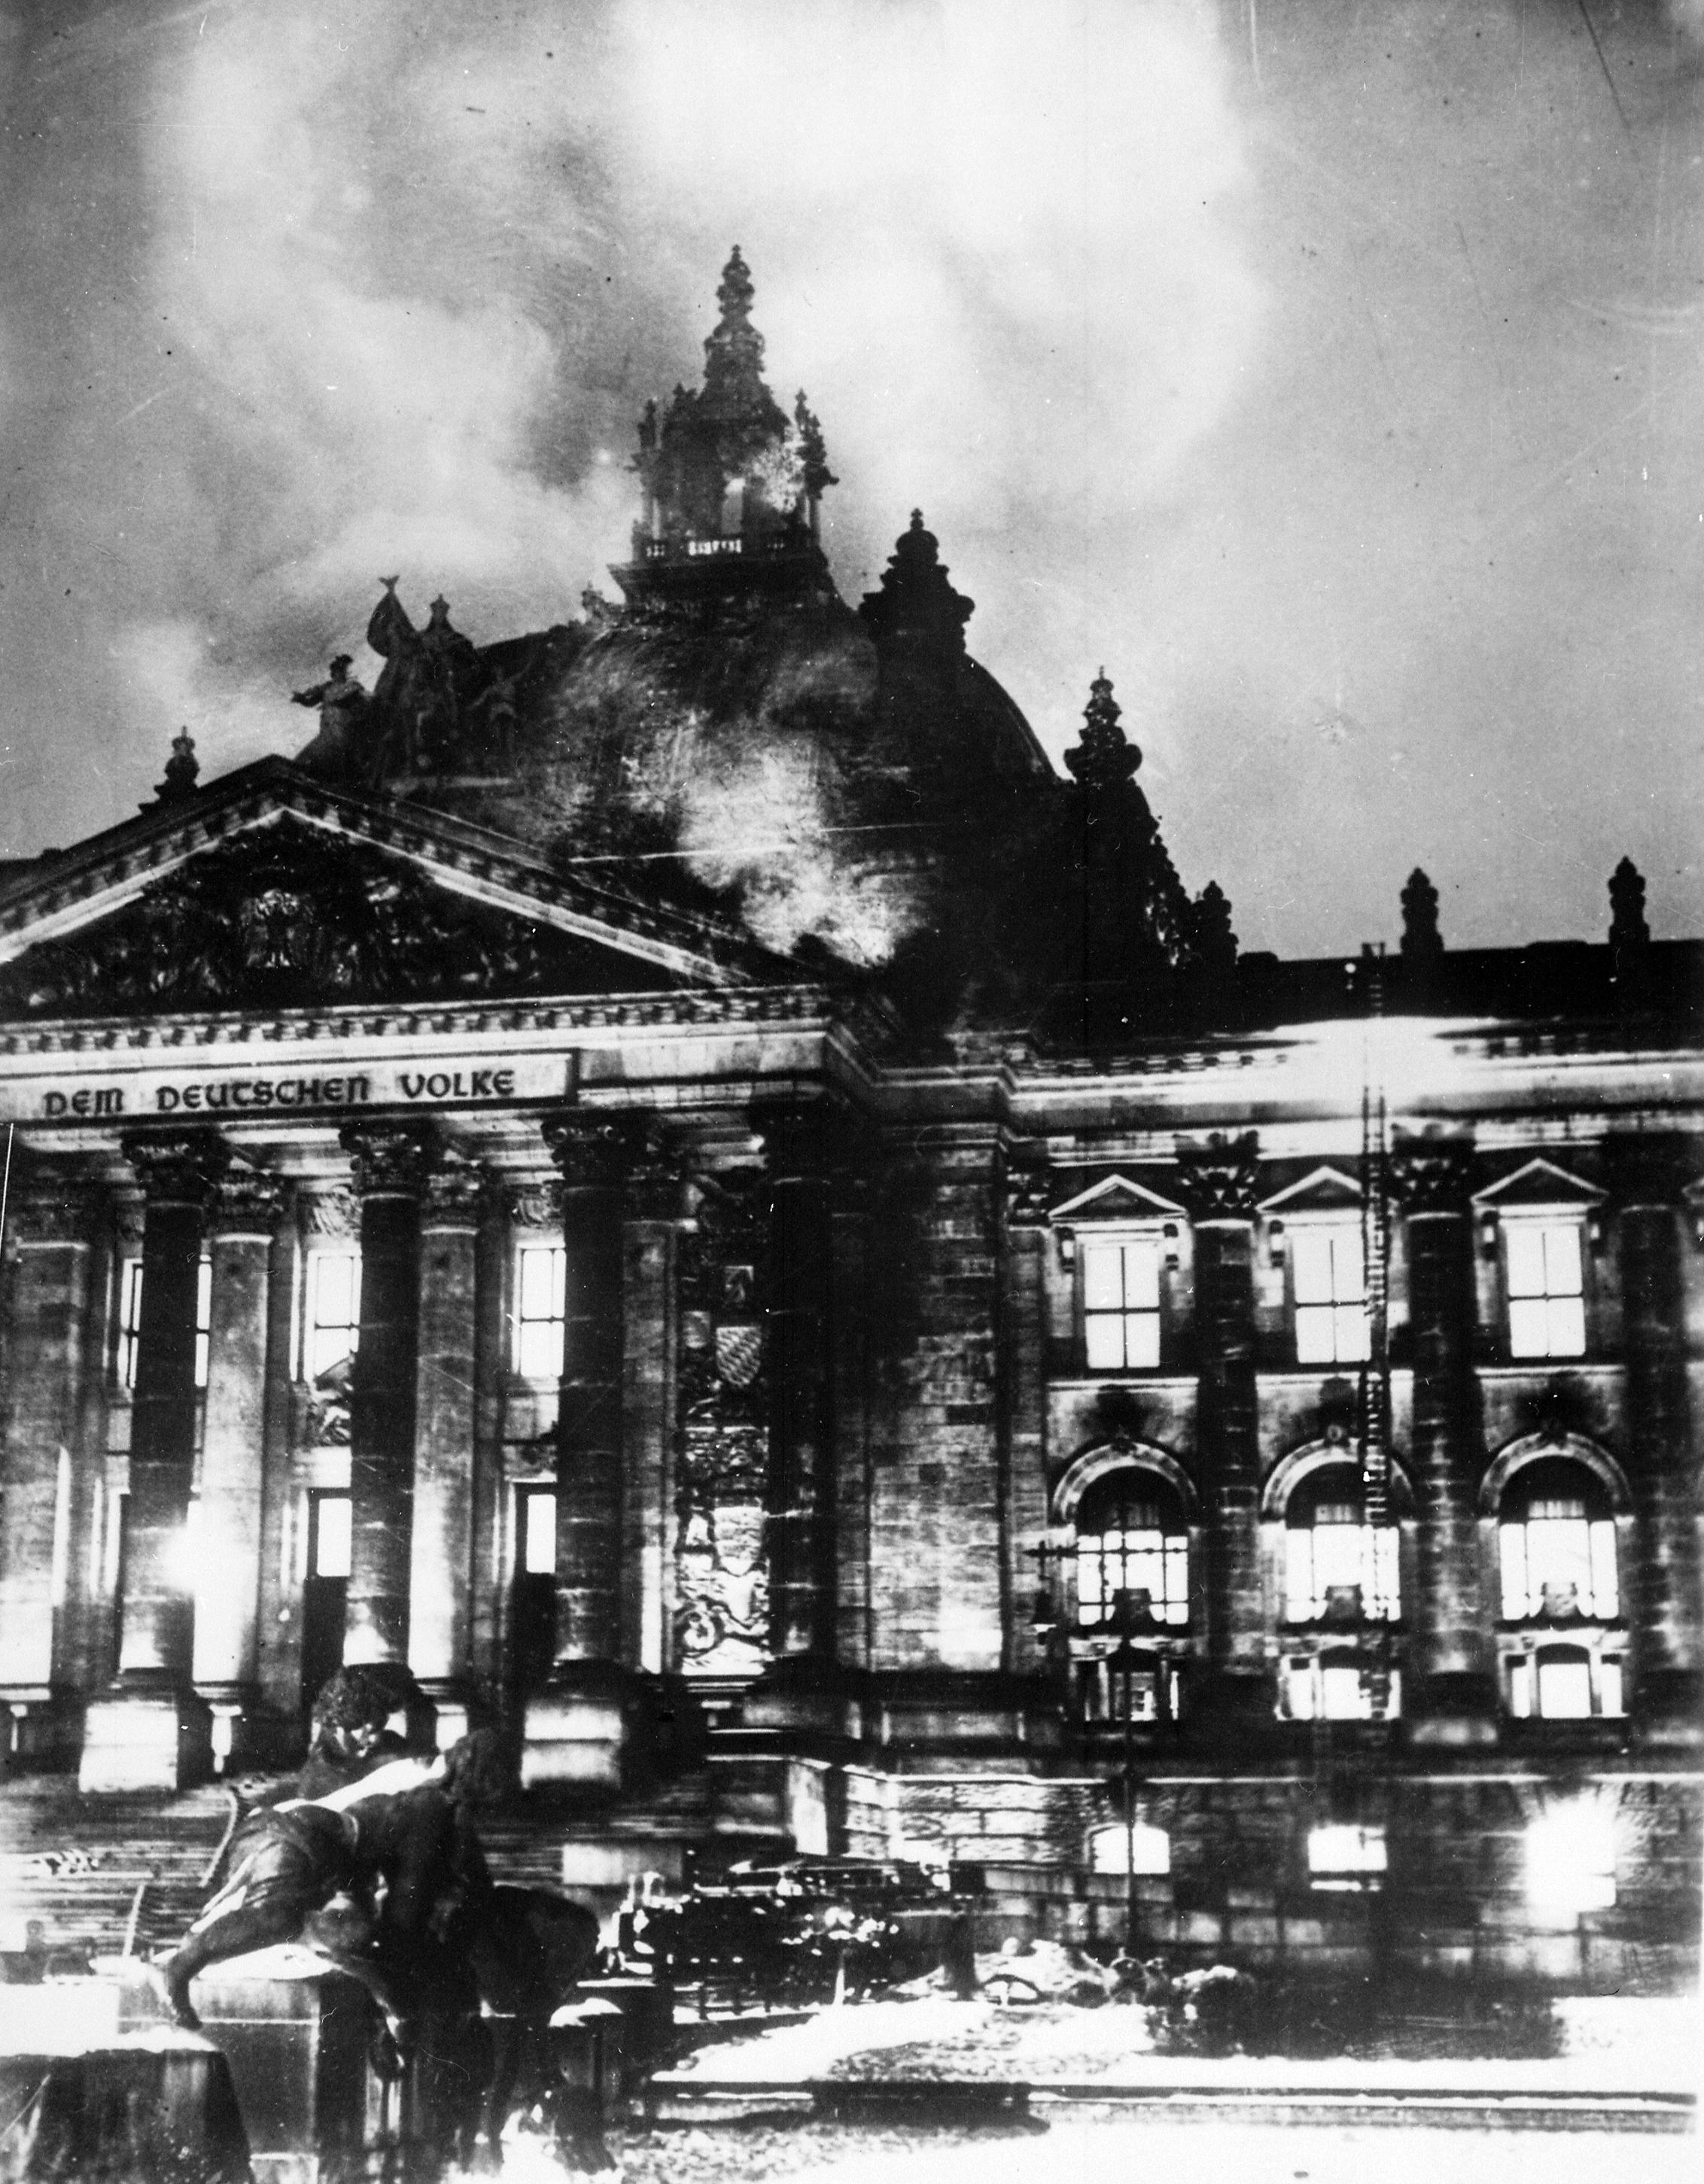 incendie du Reichtsag février 1933